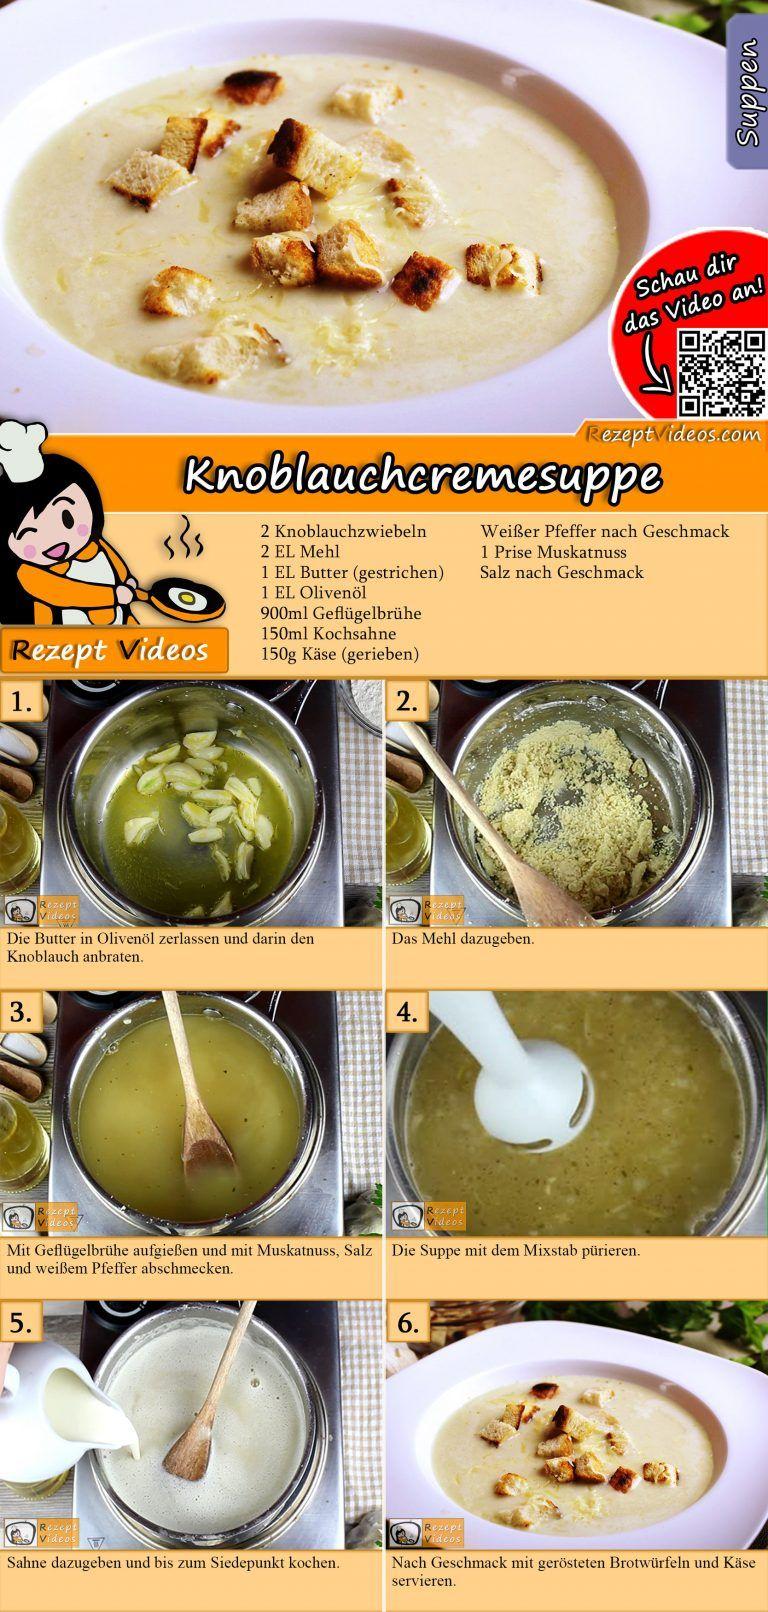 Knoblauchcremesuppe Rezept Knoblauchcremesuppe Rezepte Und Suppenrezepte